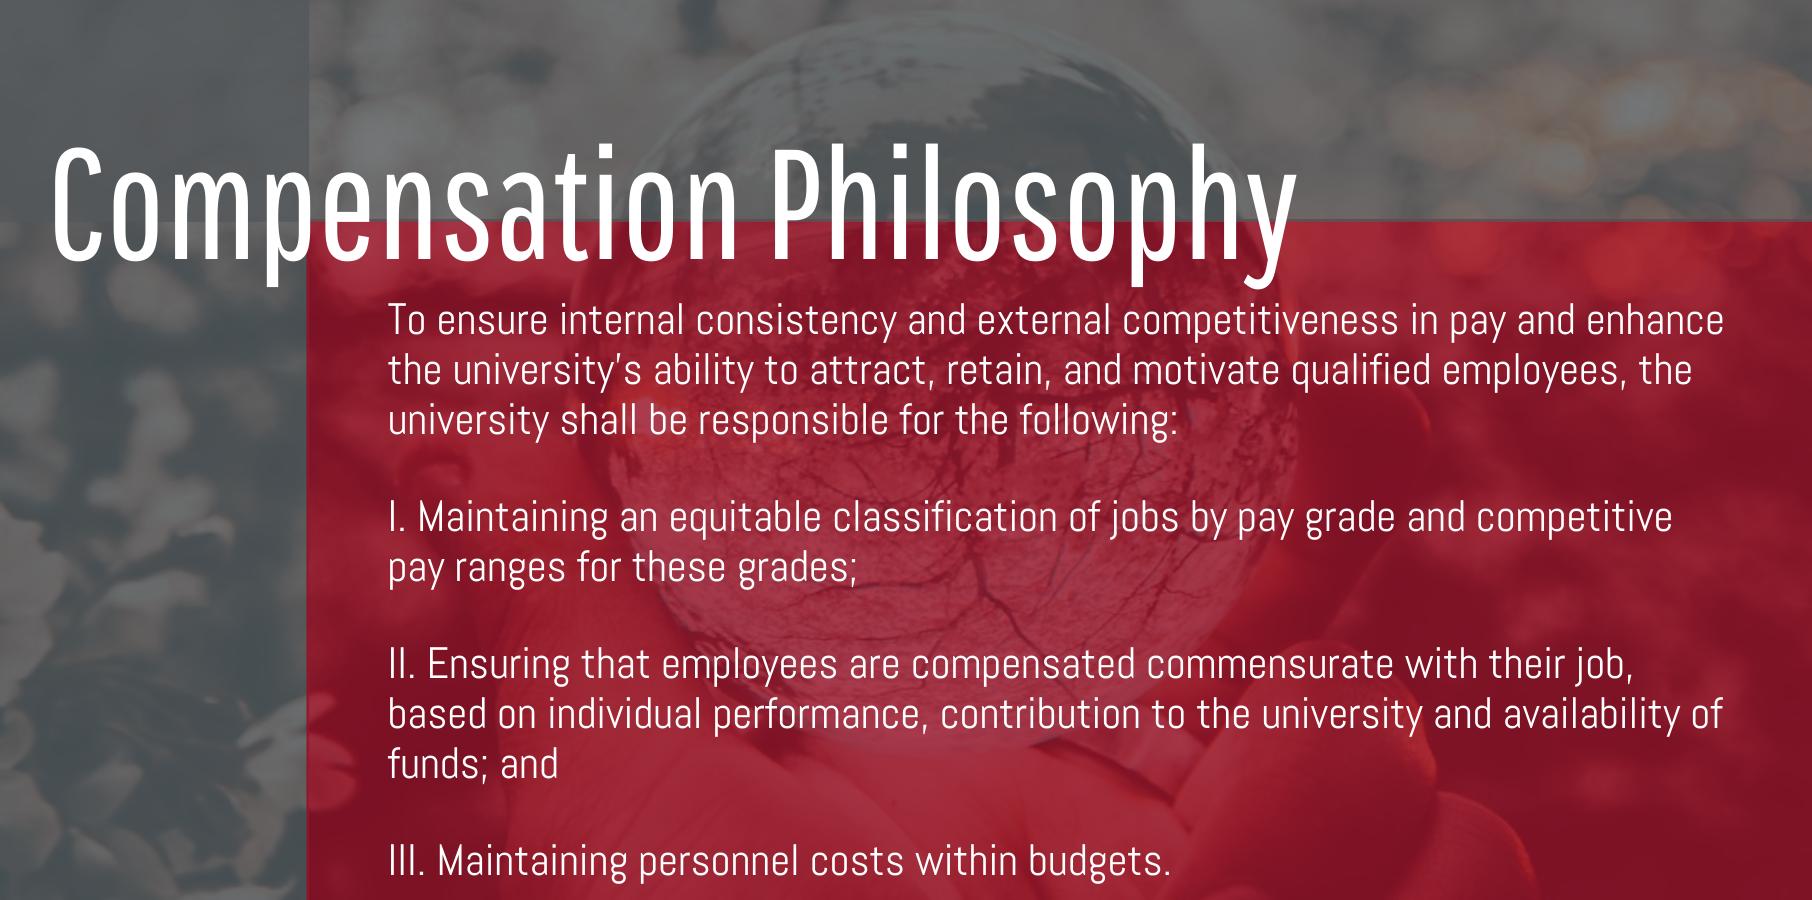 Compensation - University of Houston